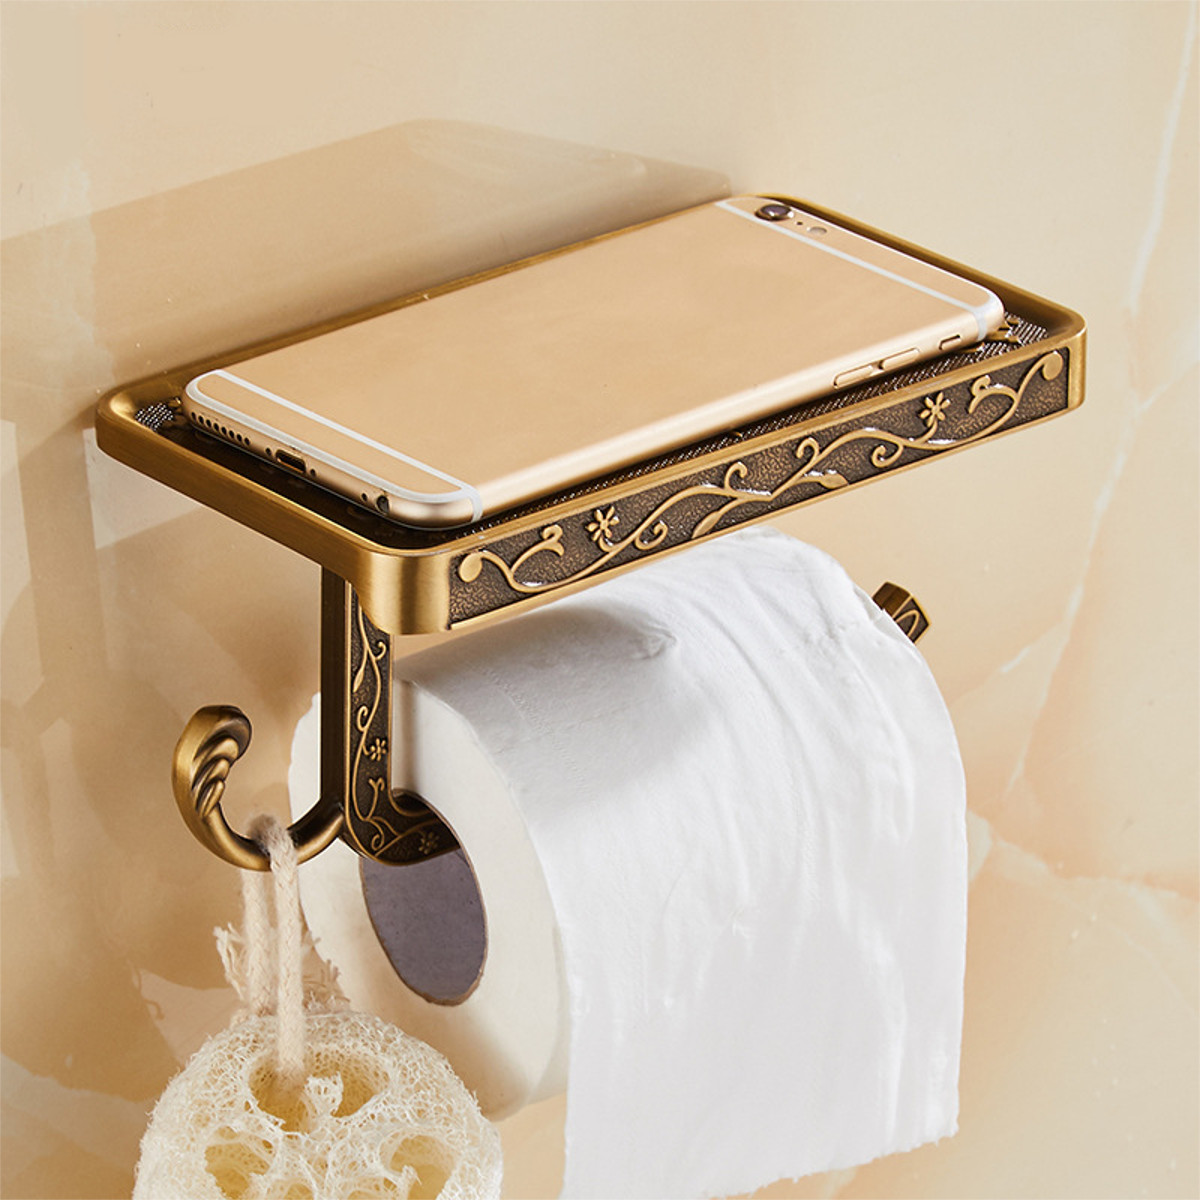 Mobile-Phone-Holder Towel-Rack Tissue-Boxes Toilet Bathroom-Paper Carved Antique